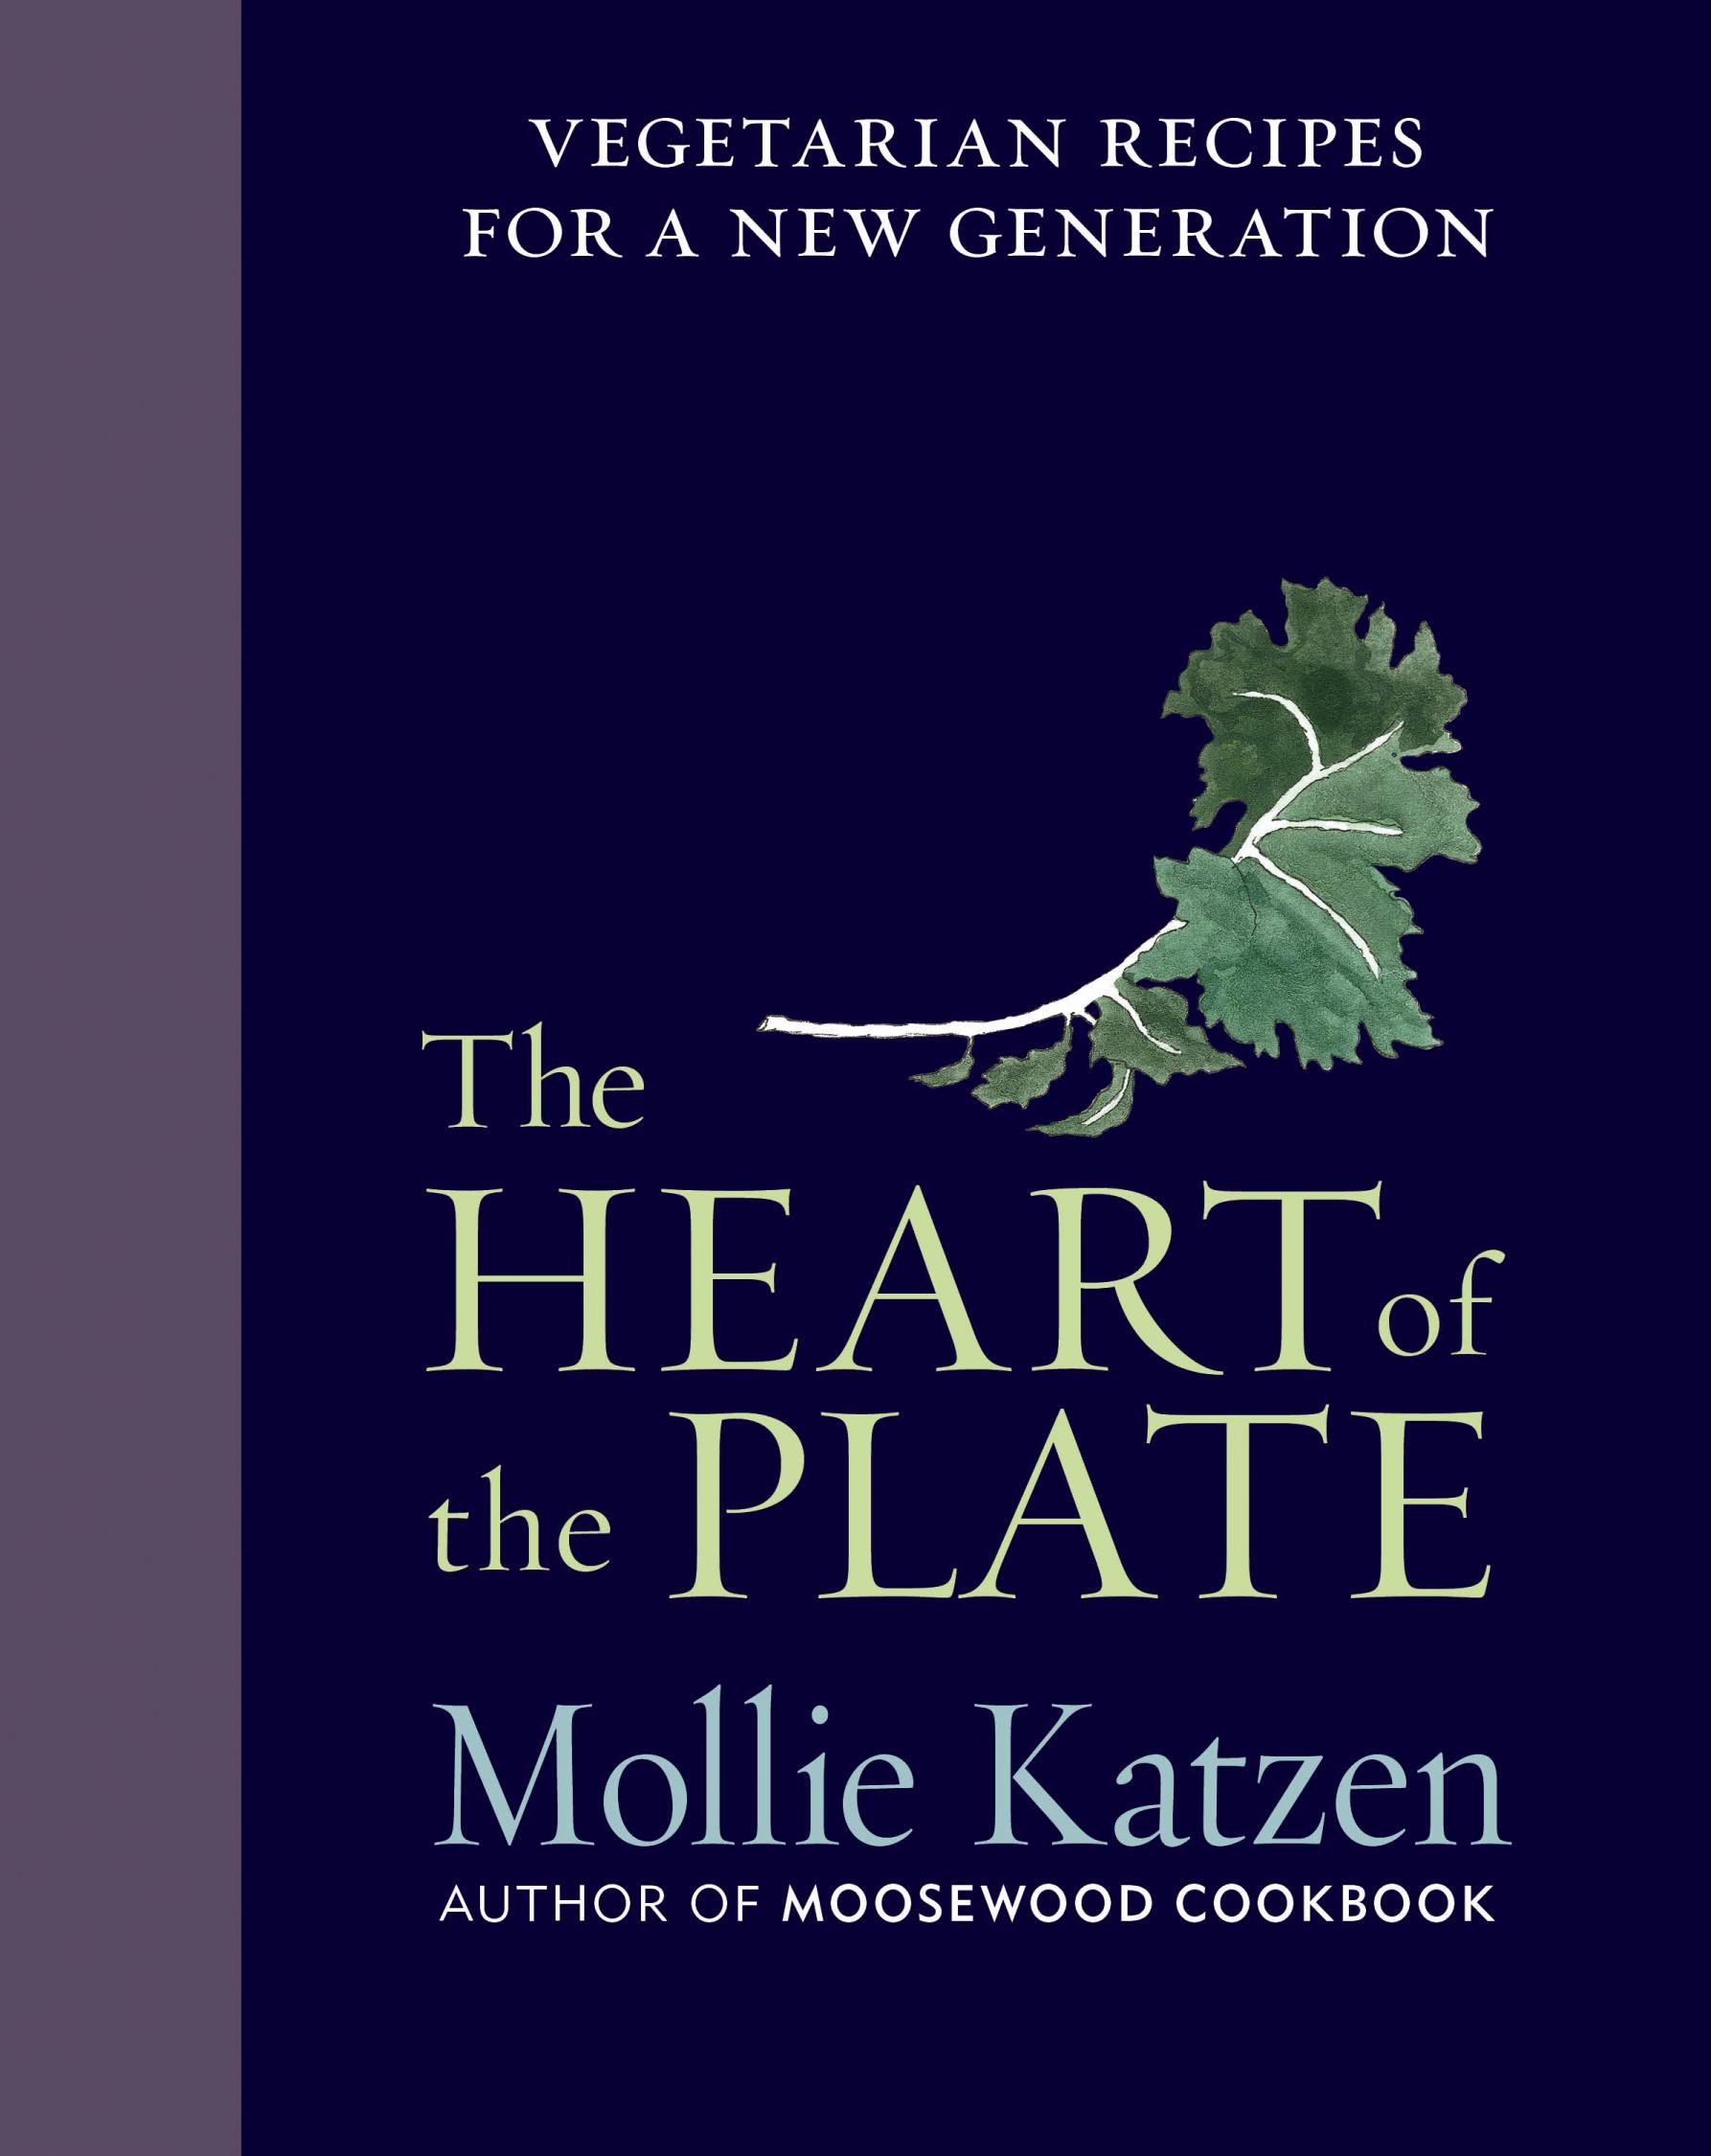 Heart of the Plate Cover Art Courtesy Houghton Mifflin Harcourt.jpg